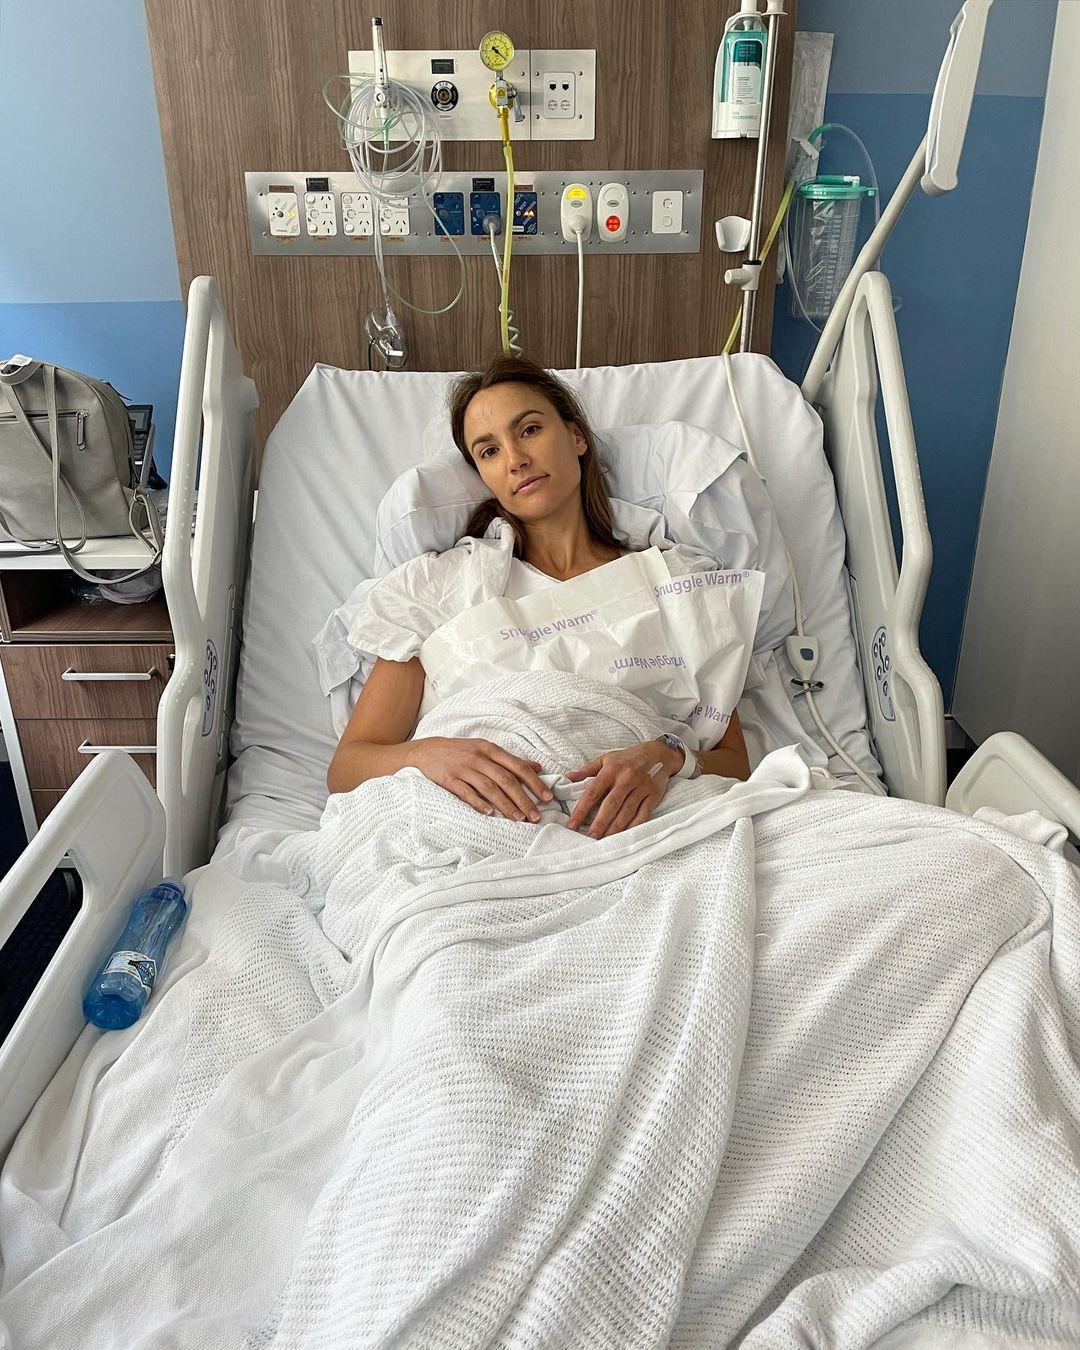 Rachael Finch told fans the surgery was a huge success.